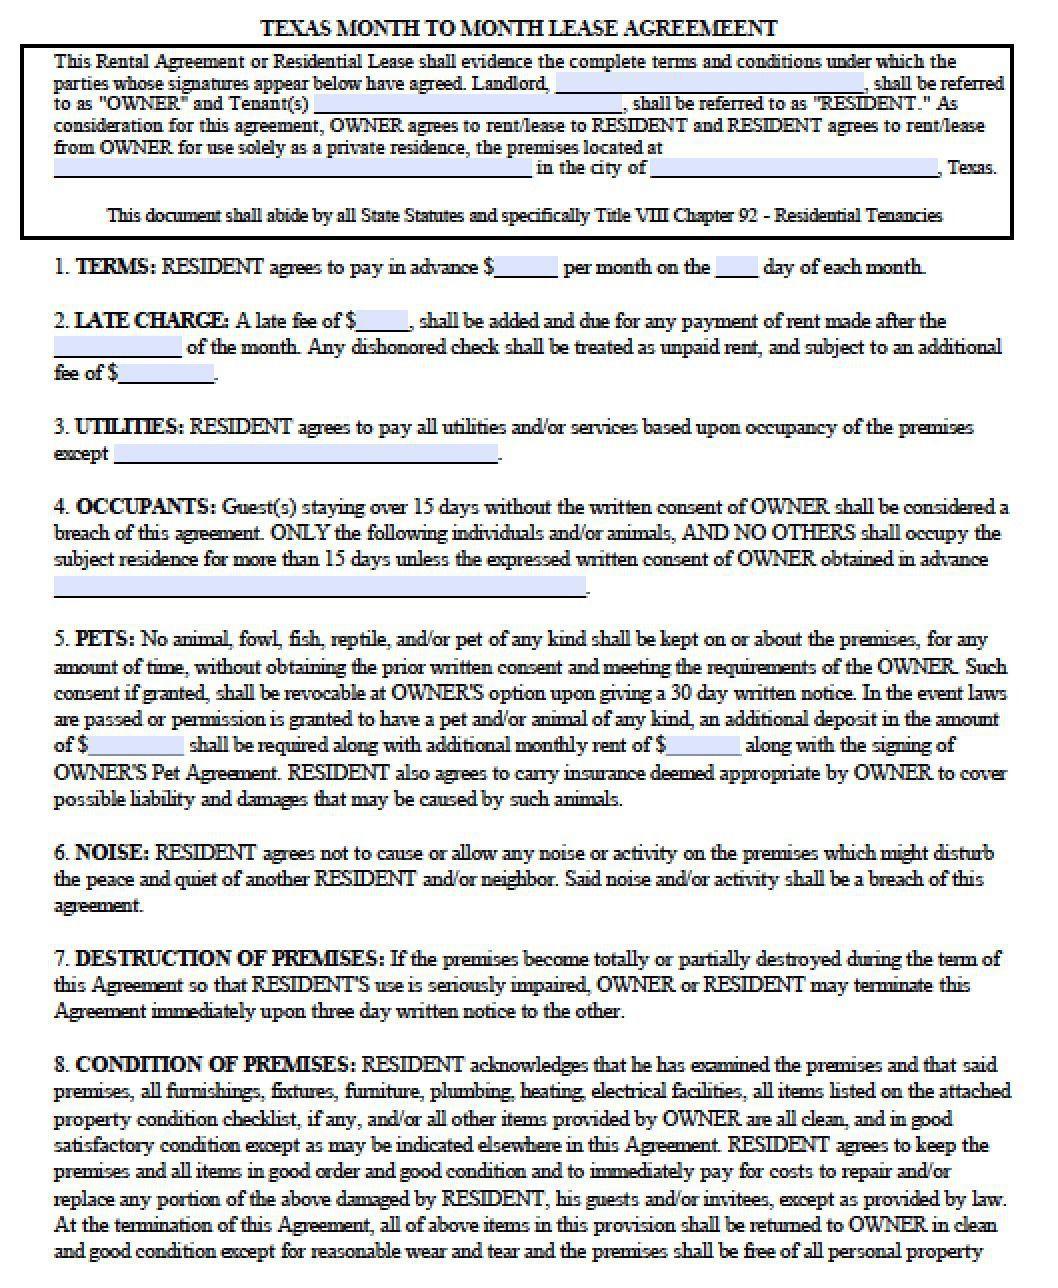 005 Dreaded Apartment Lease Agreement Form Texa Highest Quality Full